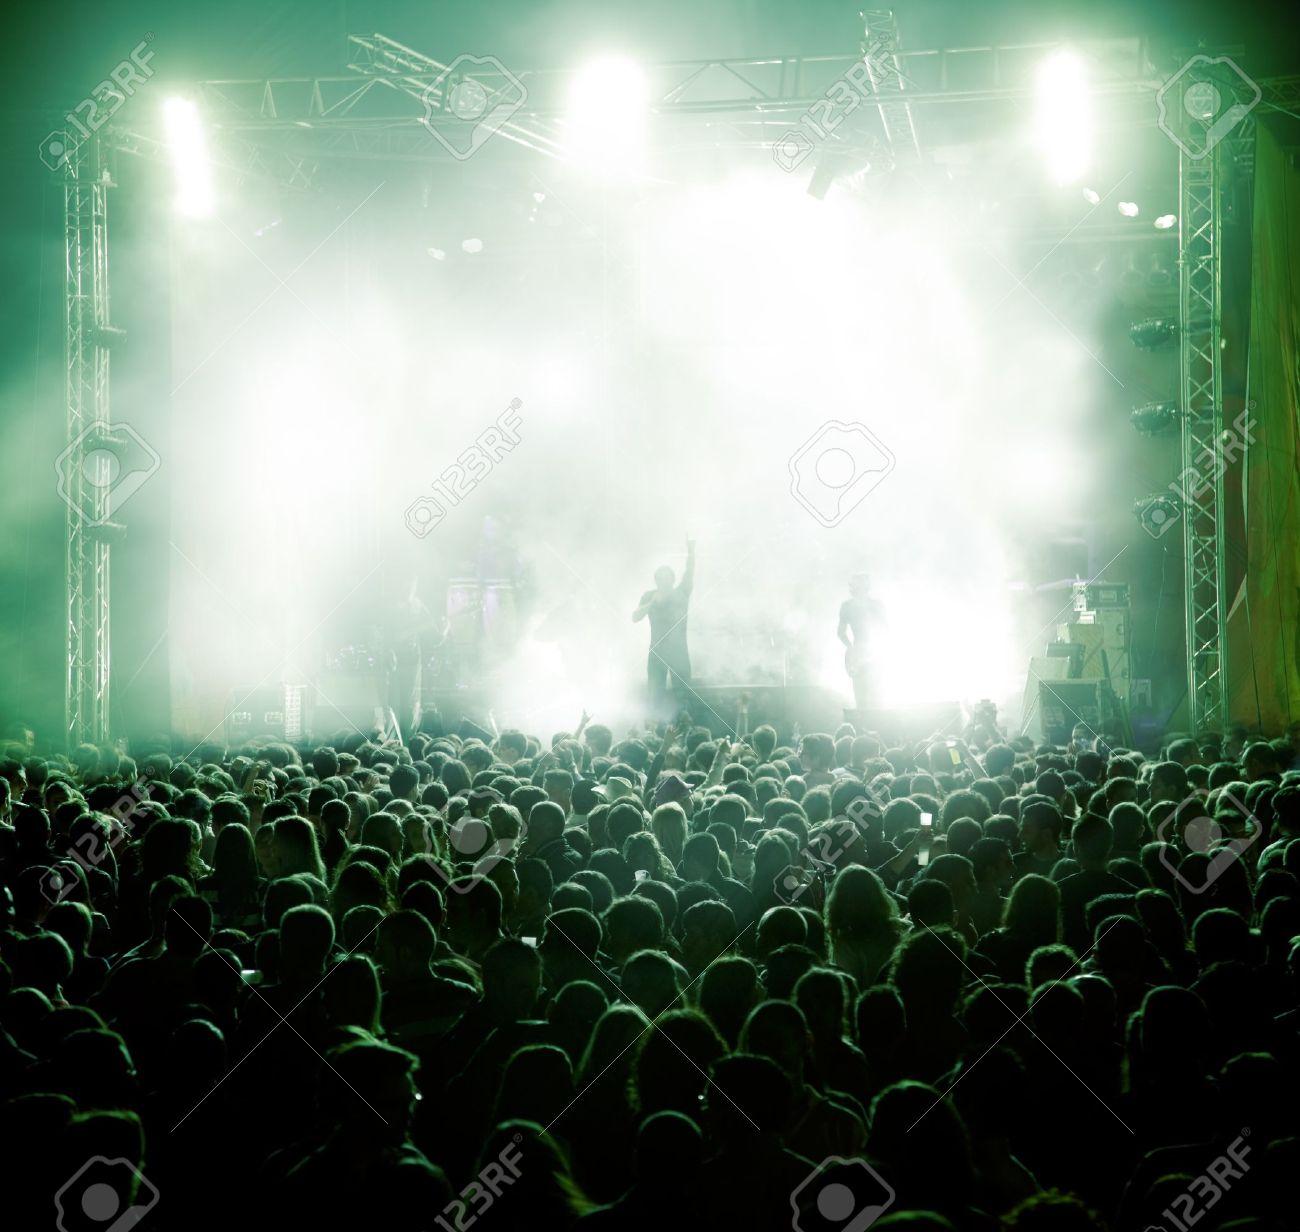 Pics photos rock concert background - Rock Concert Live Music Concert And Public Background